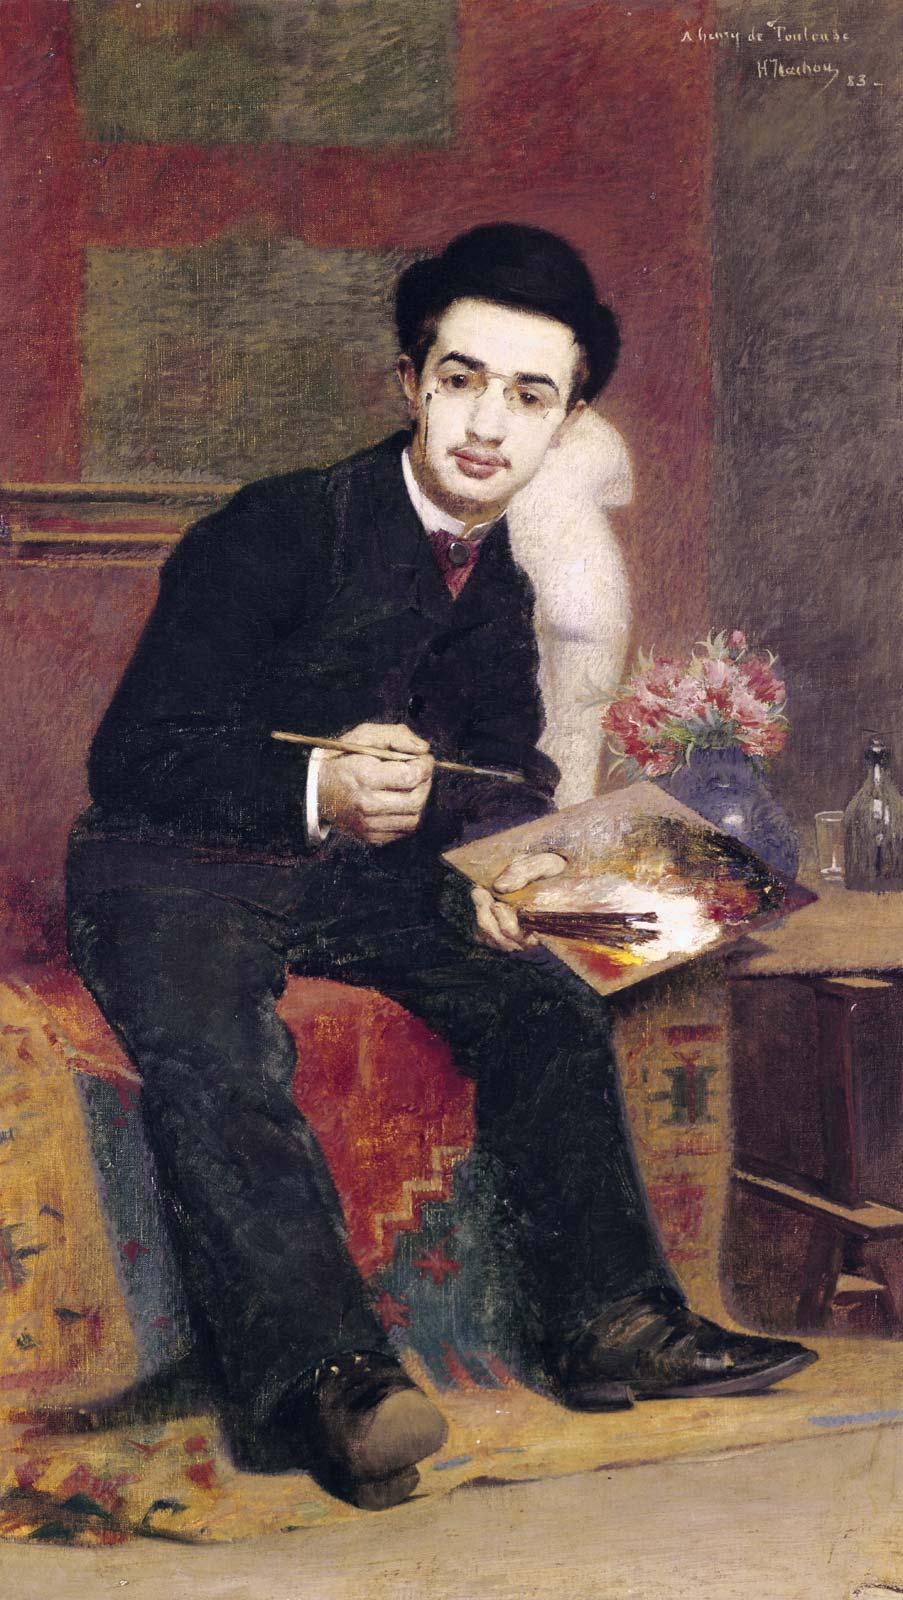 Автопортрет Анри Тулуз-Лотрека, 20 лет, 1884 год